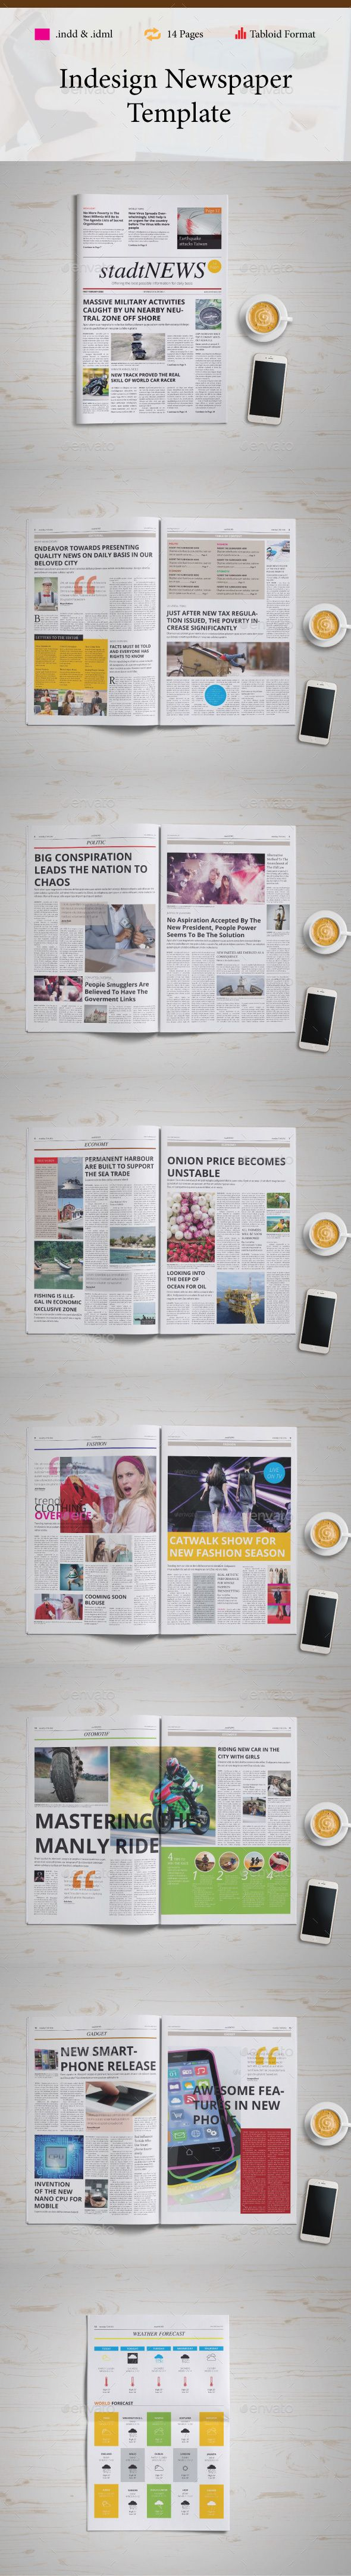 25 trending indesign newspaper template ideas on. Black Bedroom Furniture Sets. Home Design Ideas